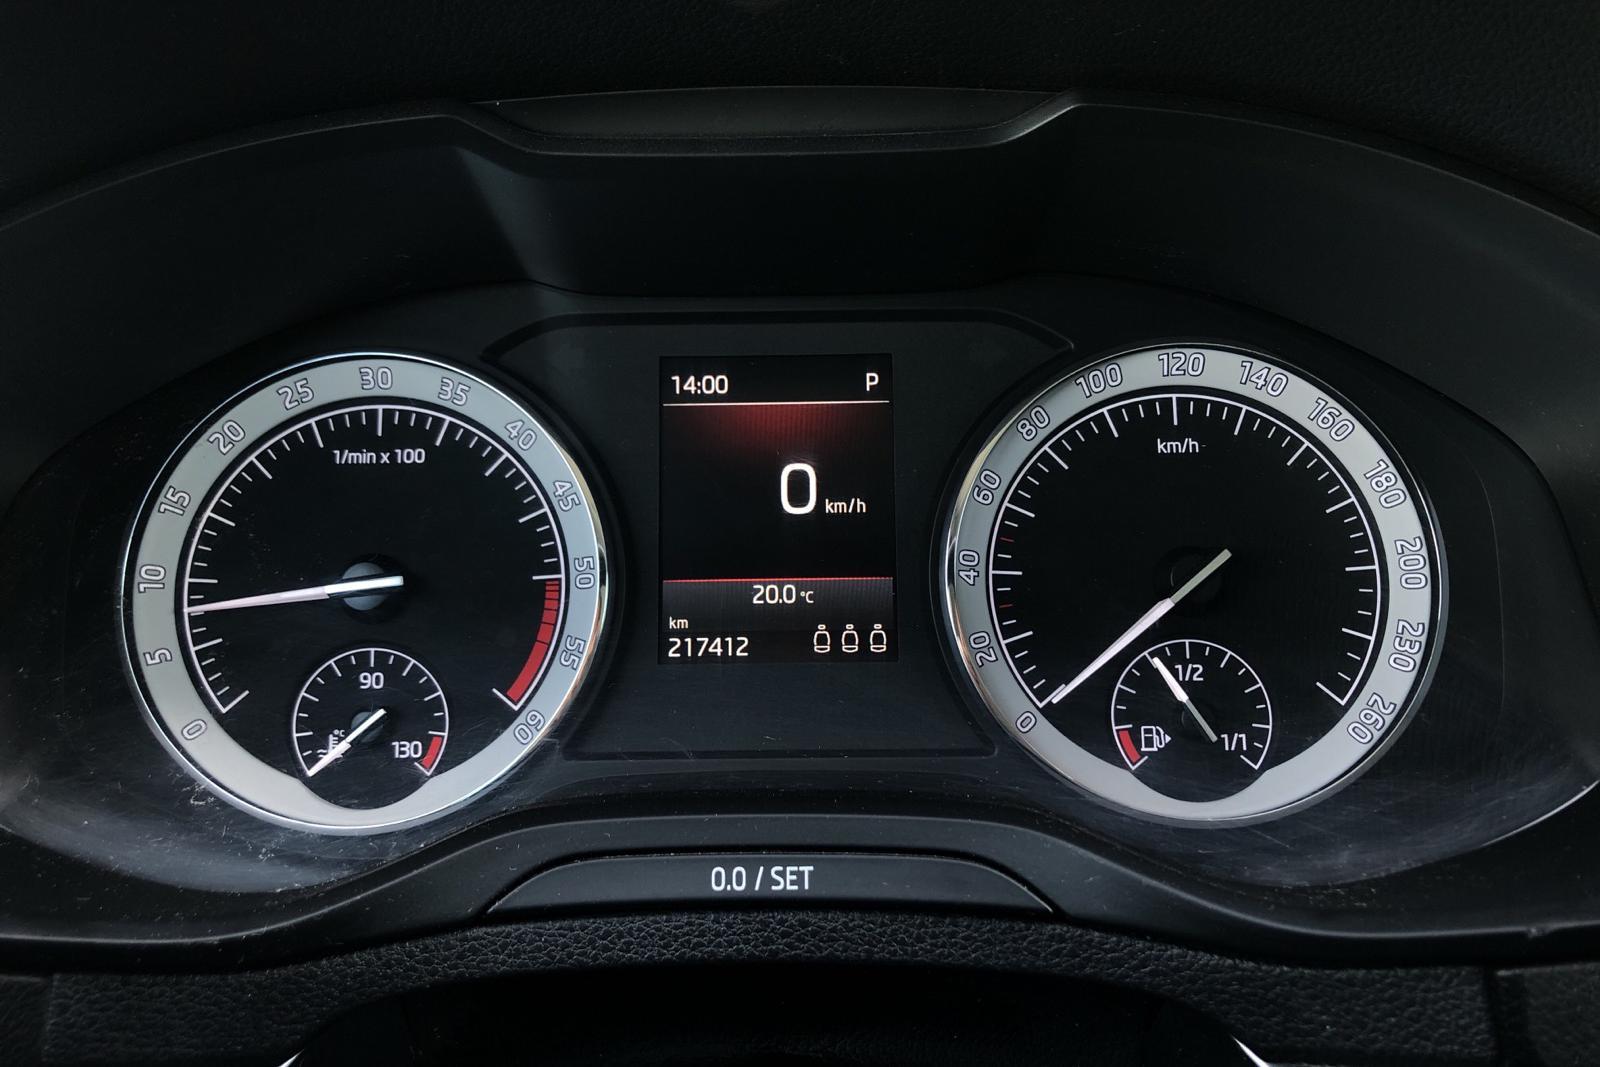 Skoda Karoq 2.0 TDI 4X4 (150hk) - 217 400 km - Automatic - white - 2018